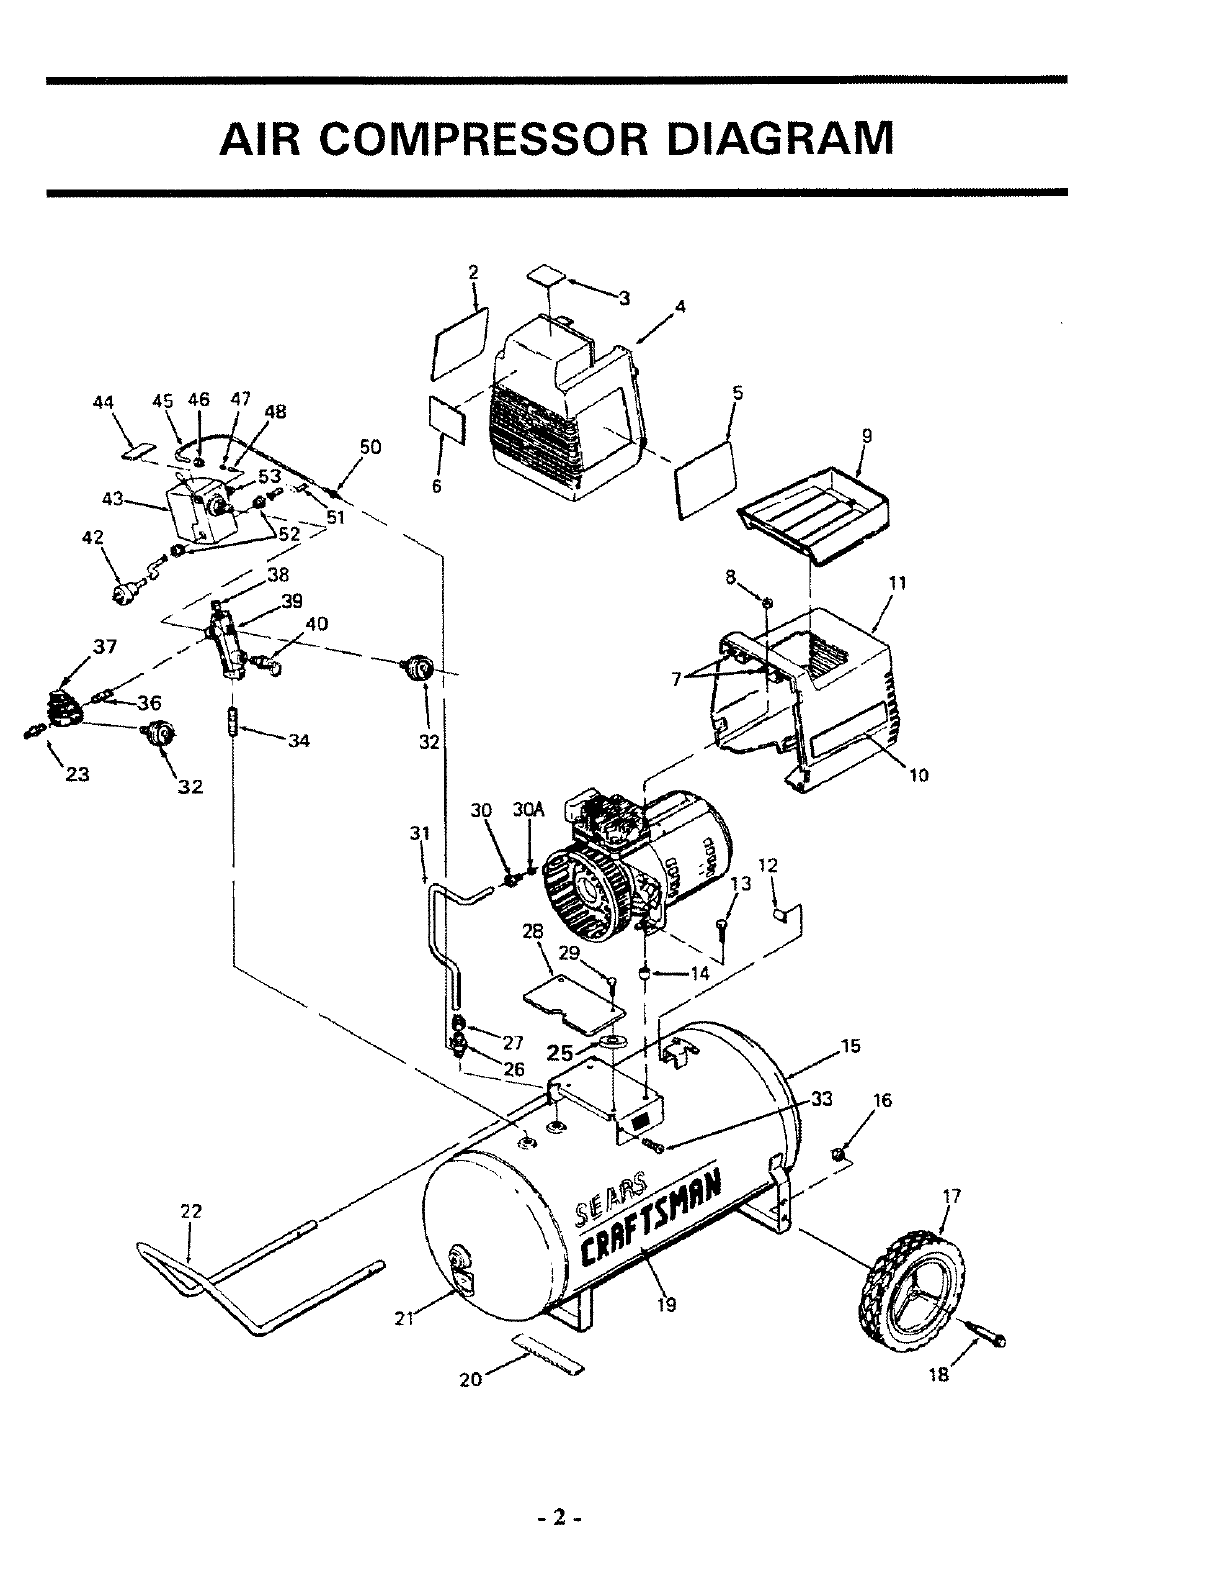 Craftsman User Manual Air Compressor Manuals And